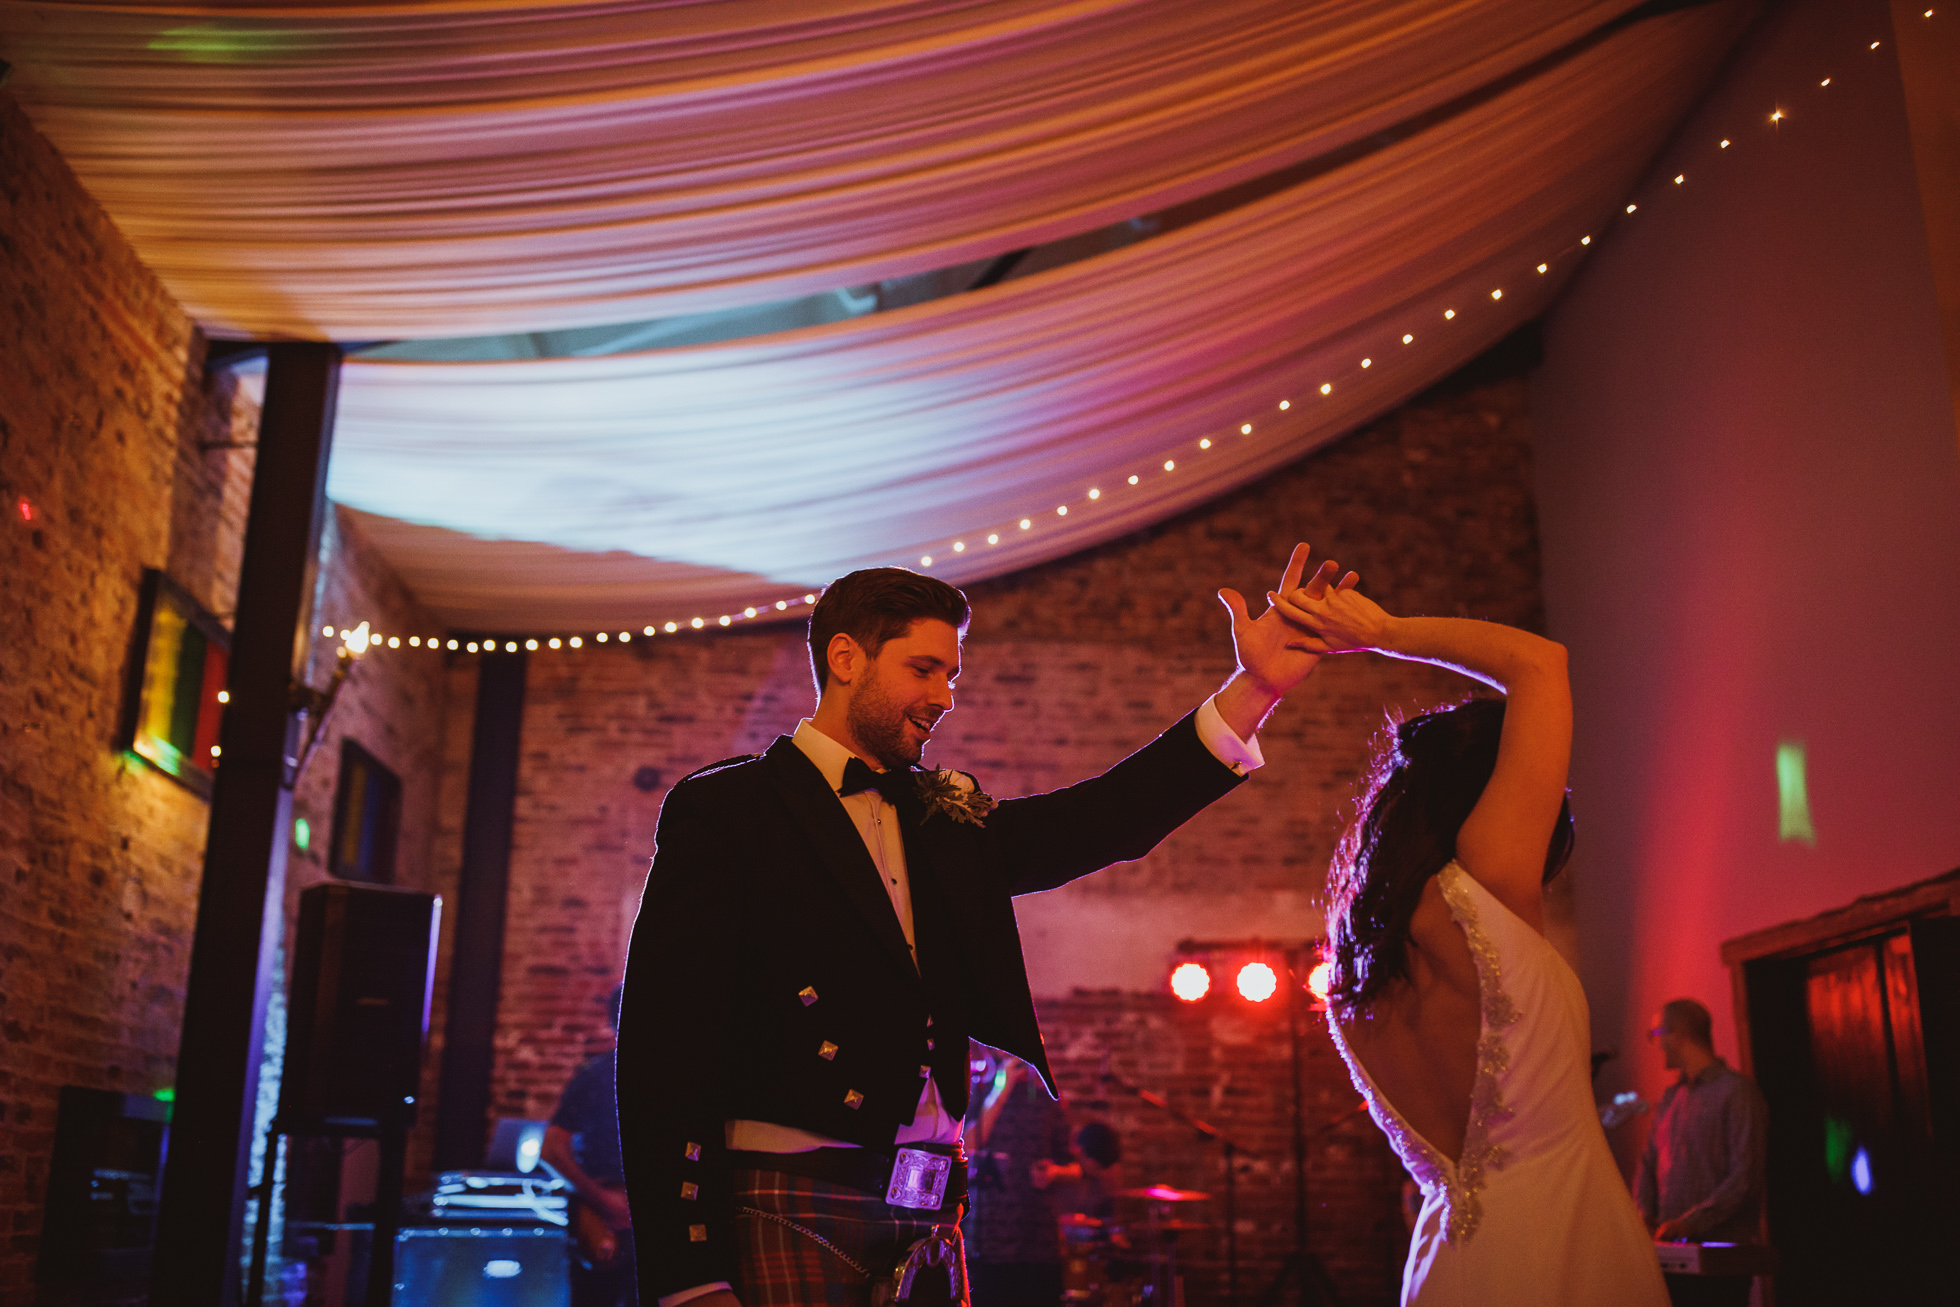 hornington_manor_wedding_photographer-119.jpg